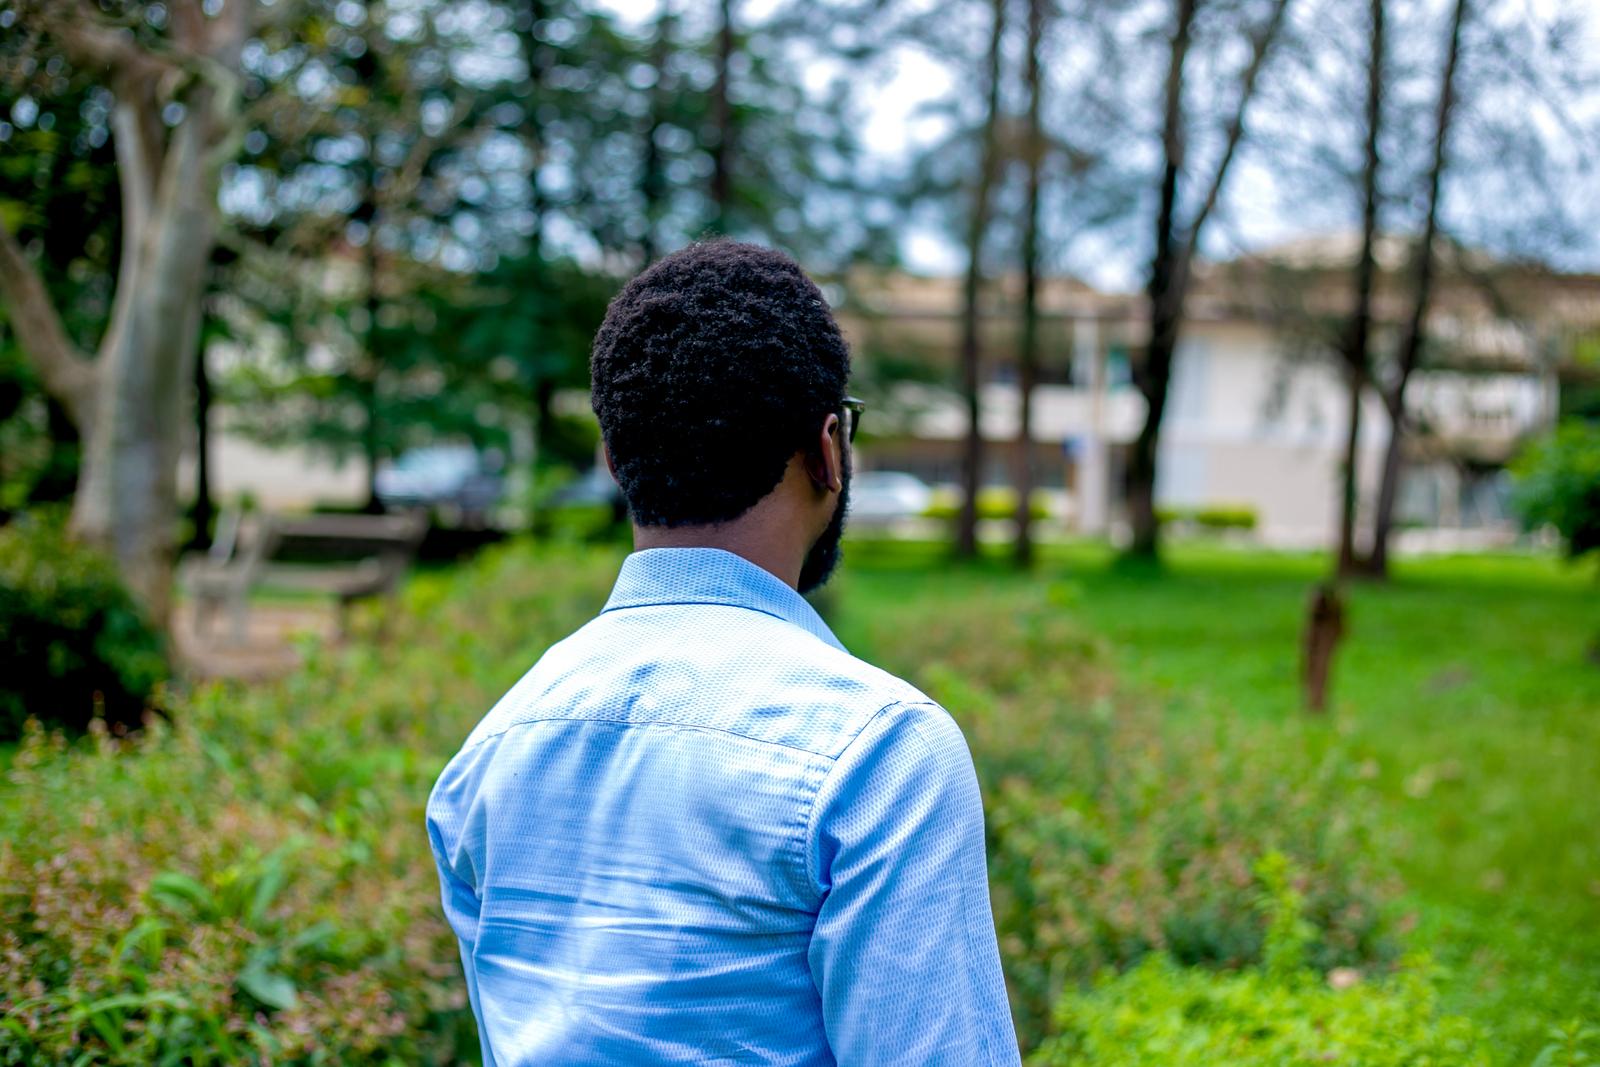 Soyombo's 'Lekki Massacre' Investigation on Three-Man Shortlist for OWM's International Journalist of the Year